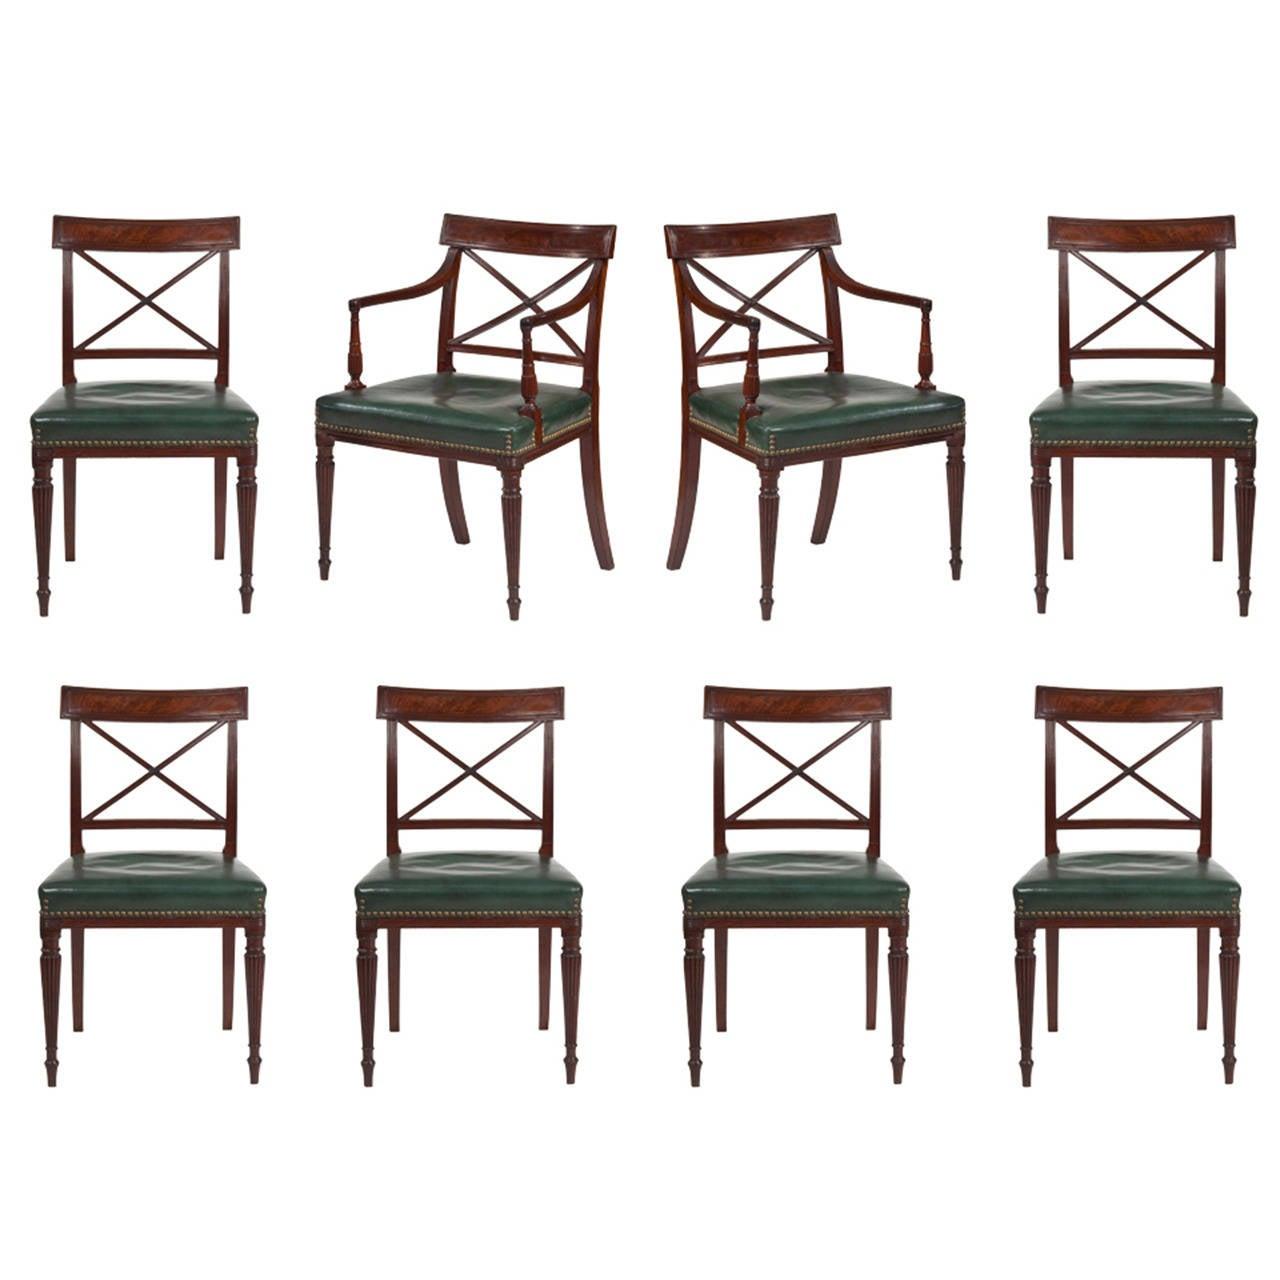 Regency dining chairs at 1stdibs for Regency dining room